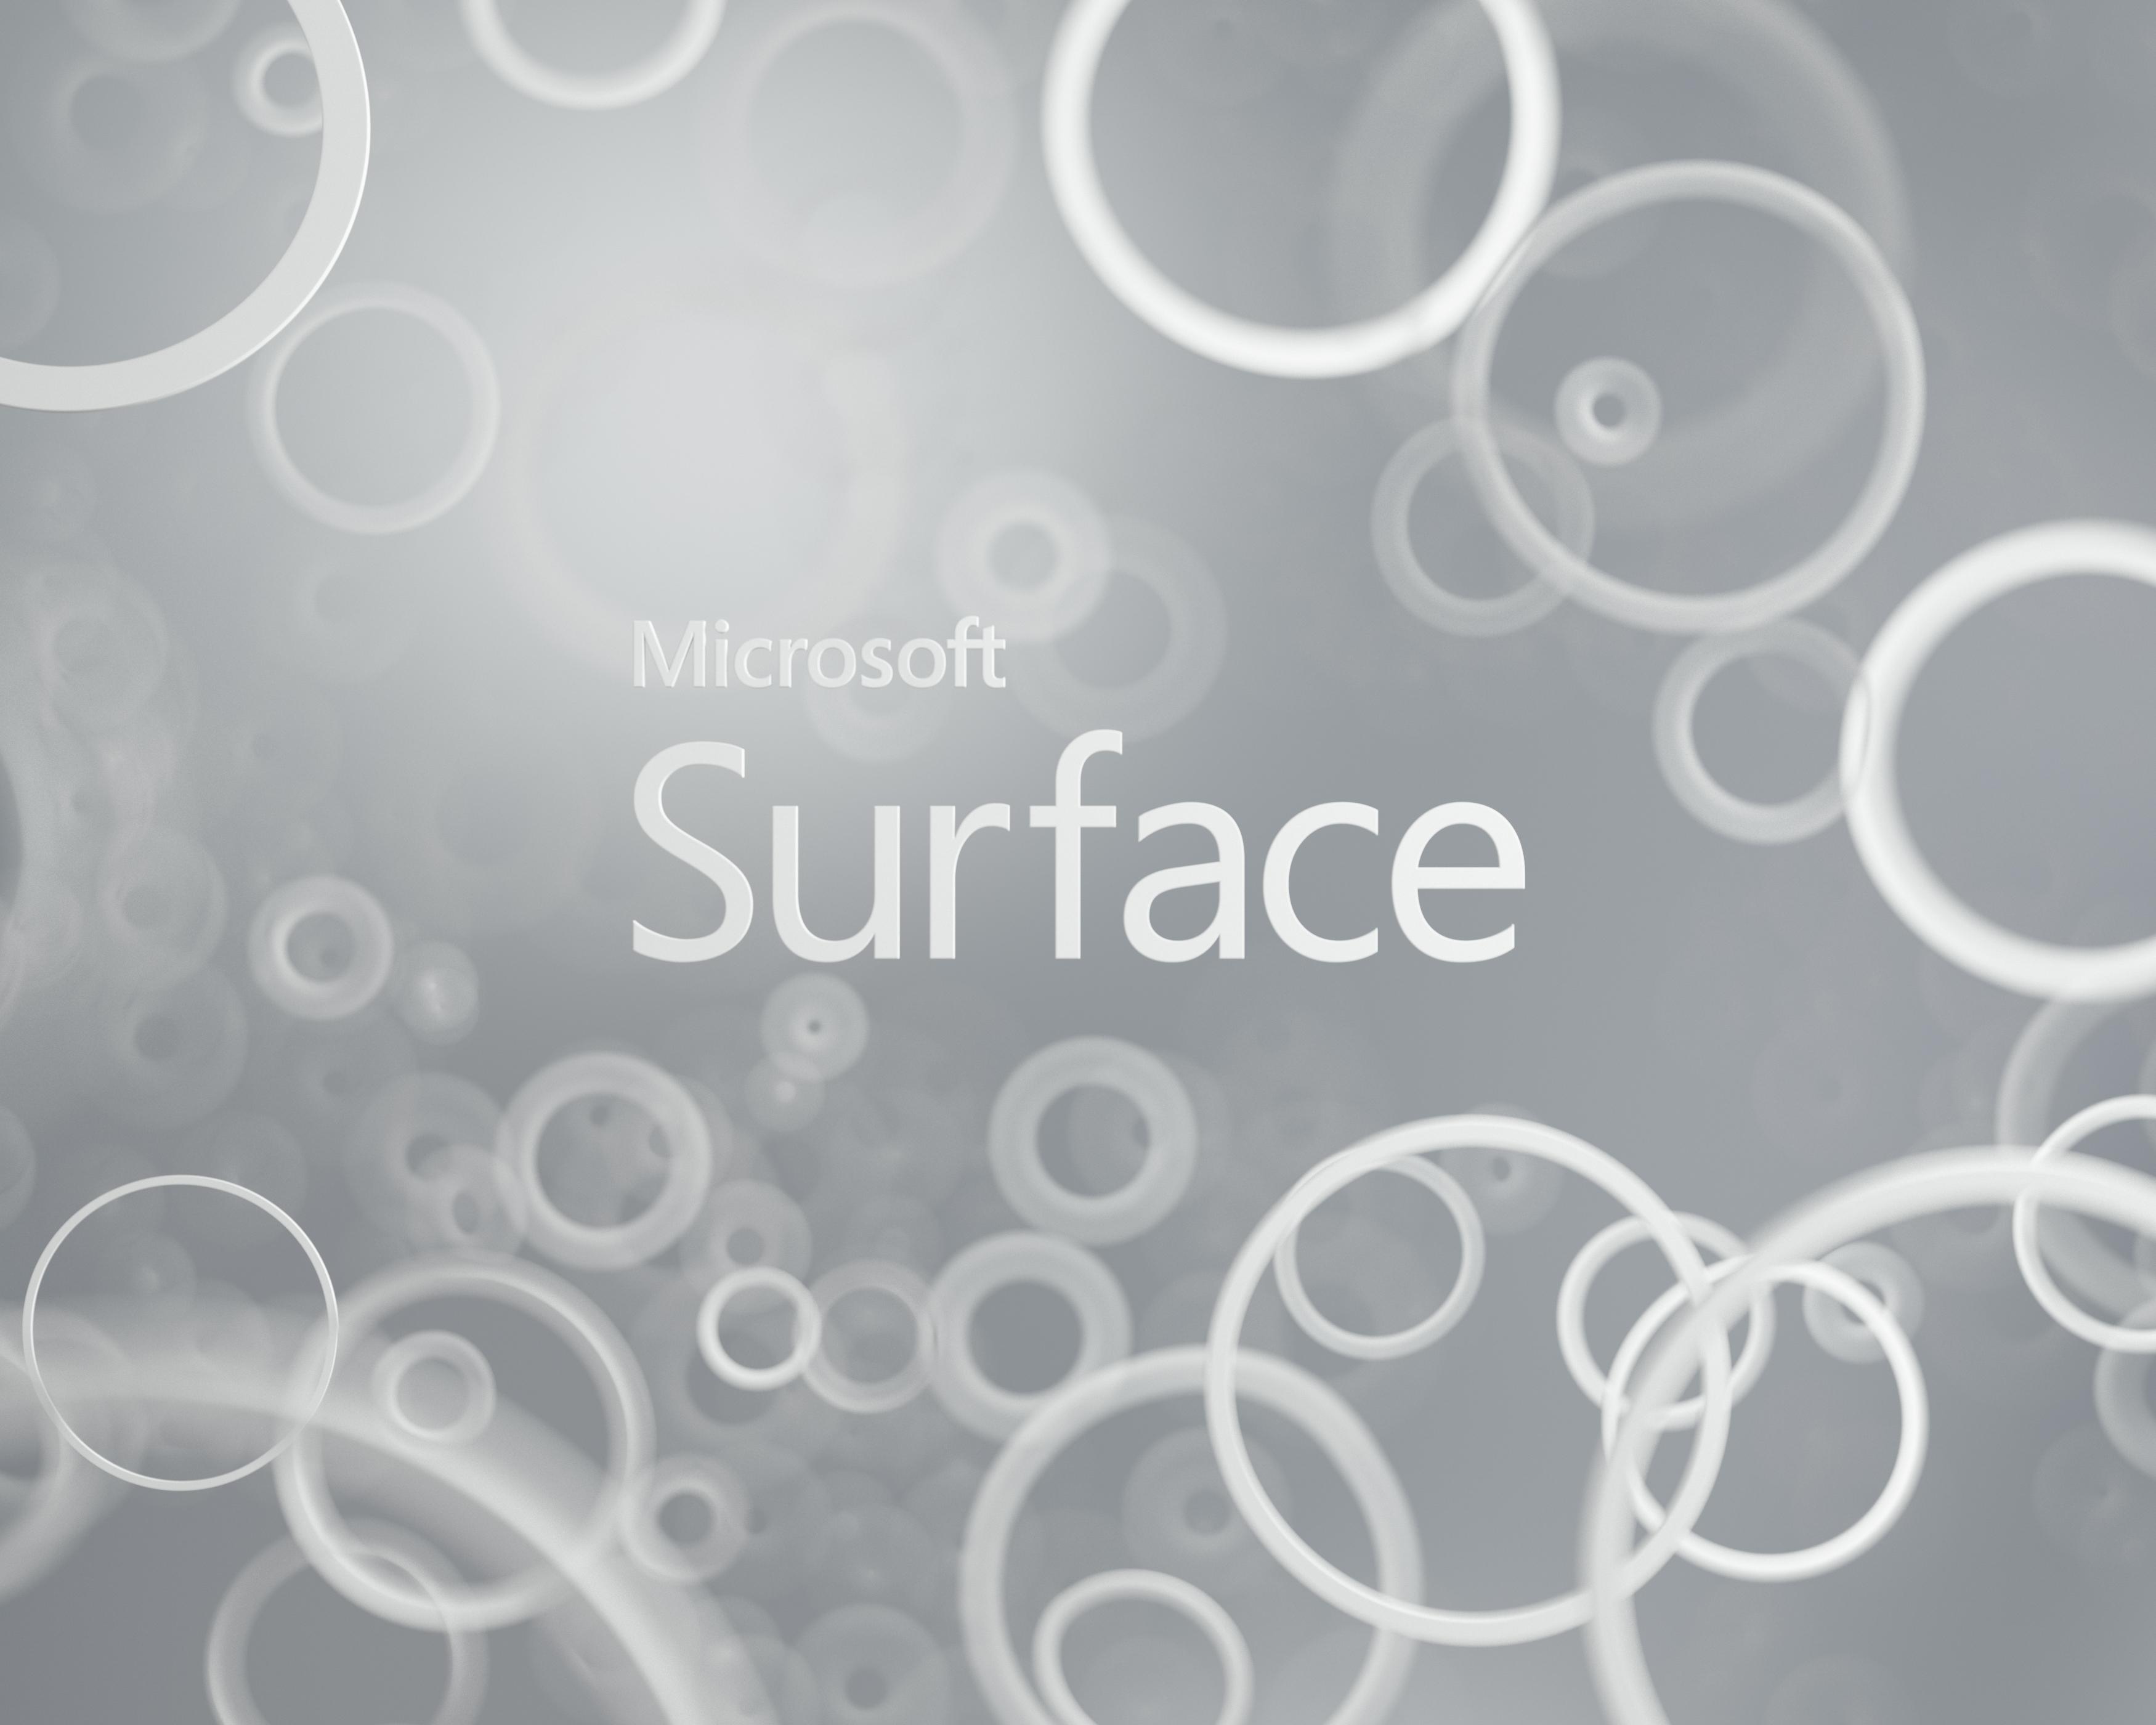 surface pro 3 wallpaper microsoft windows neowin